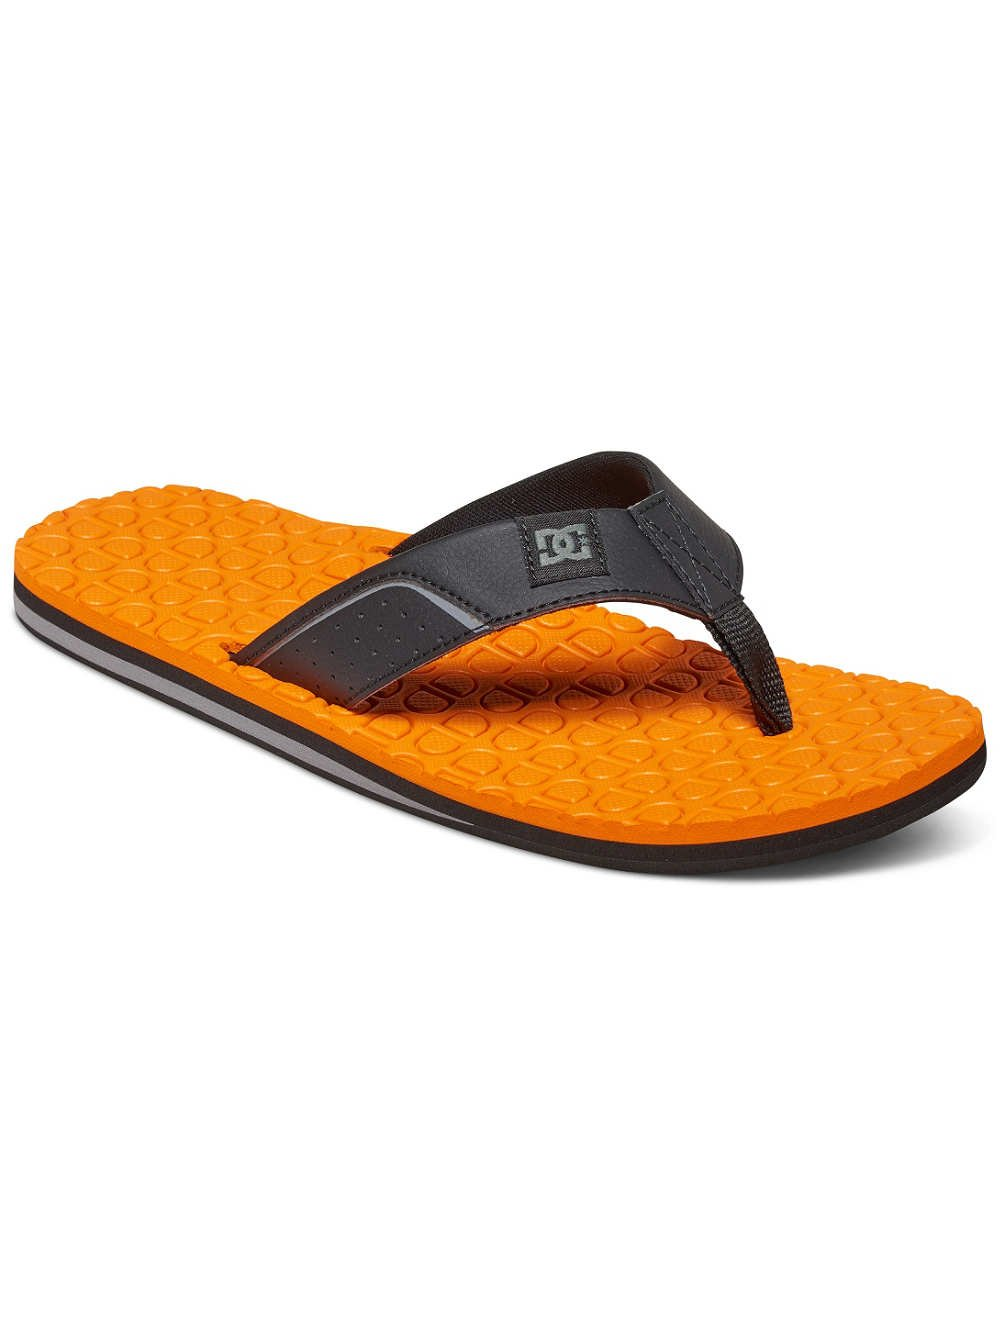 DC Shoes Kush - Sandalias Para Hombre ADYL100022 39 EU Noir - Black/Black/Orange